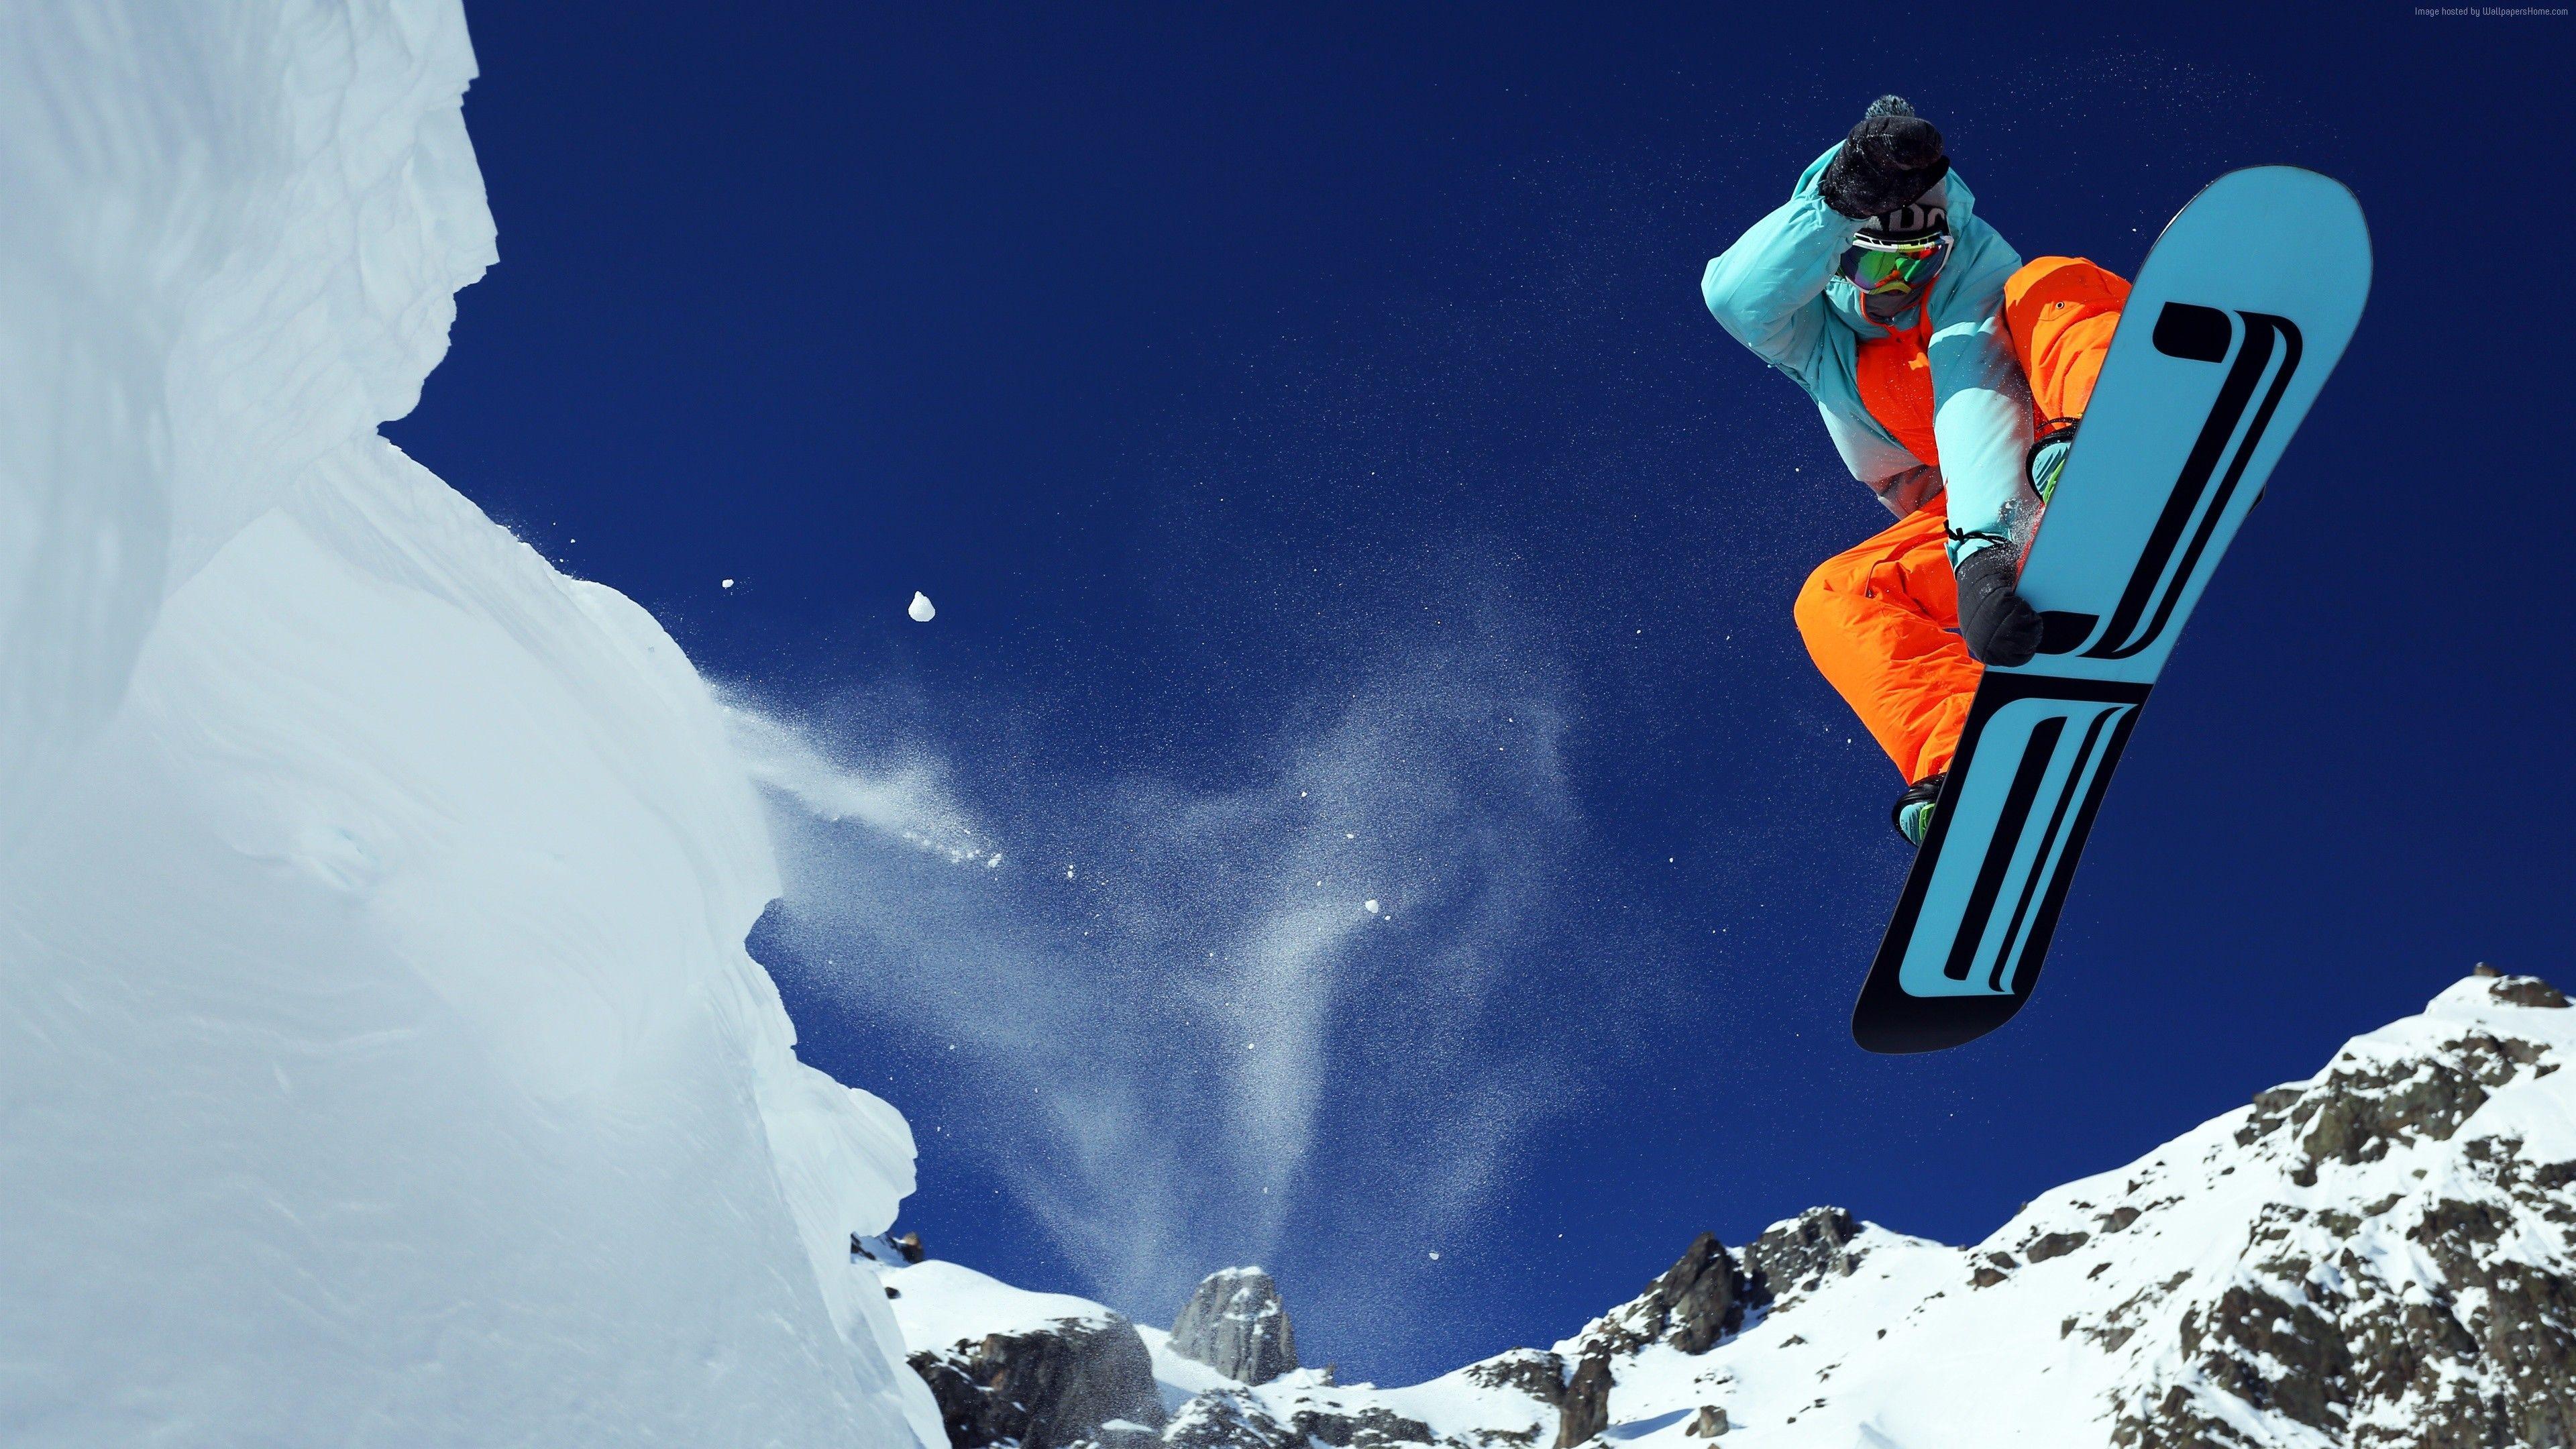 Wallpaper Extreme Snowboarding Winter Jump Snow Sport Fotografie